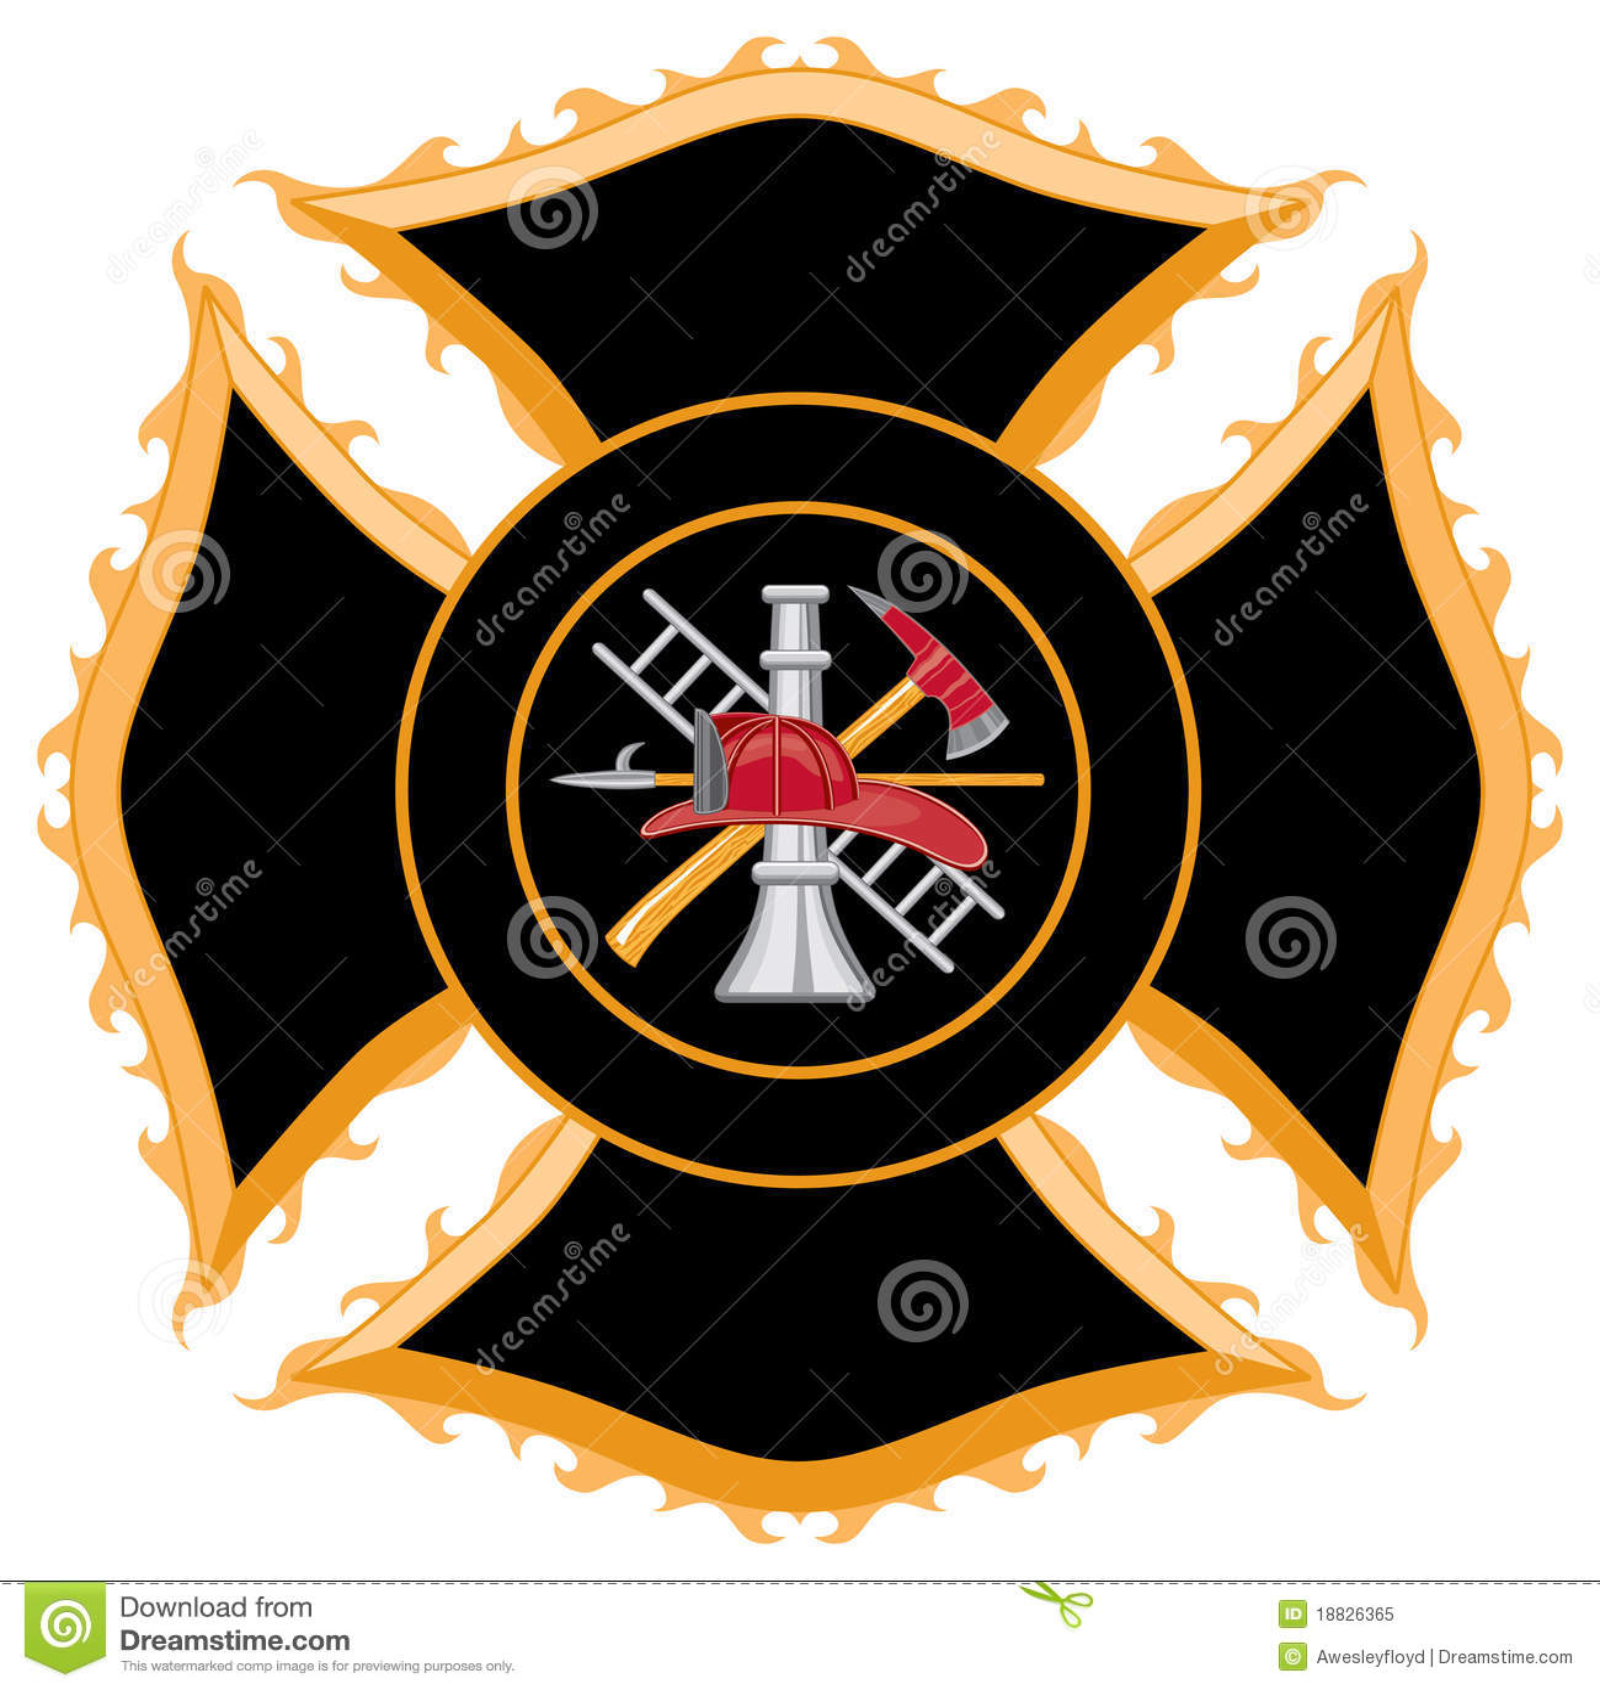 Fire Department Maltese Cross Symbol Royalty Free Stock Photo - Image ...